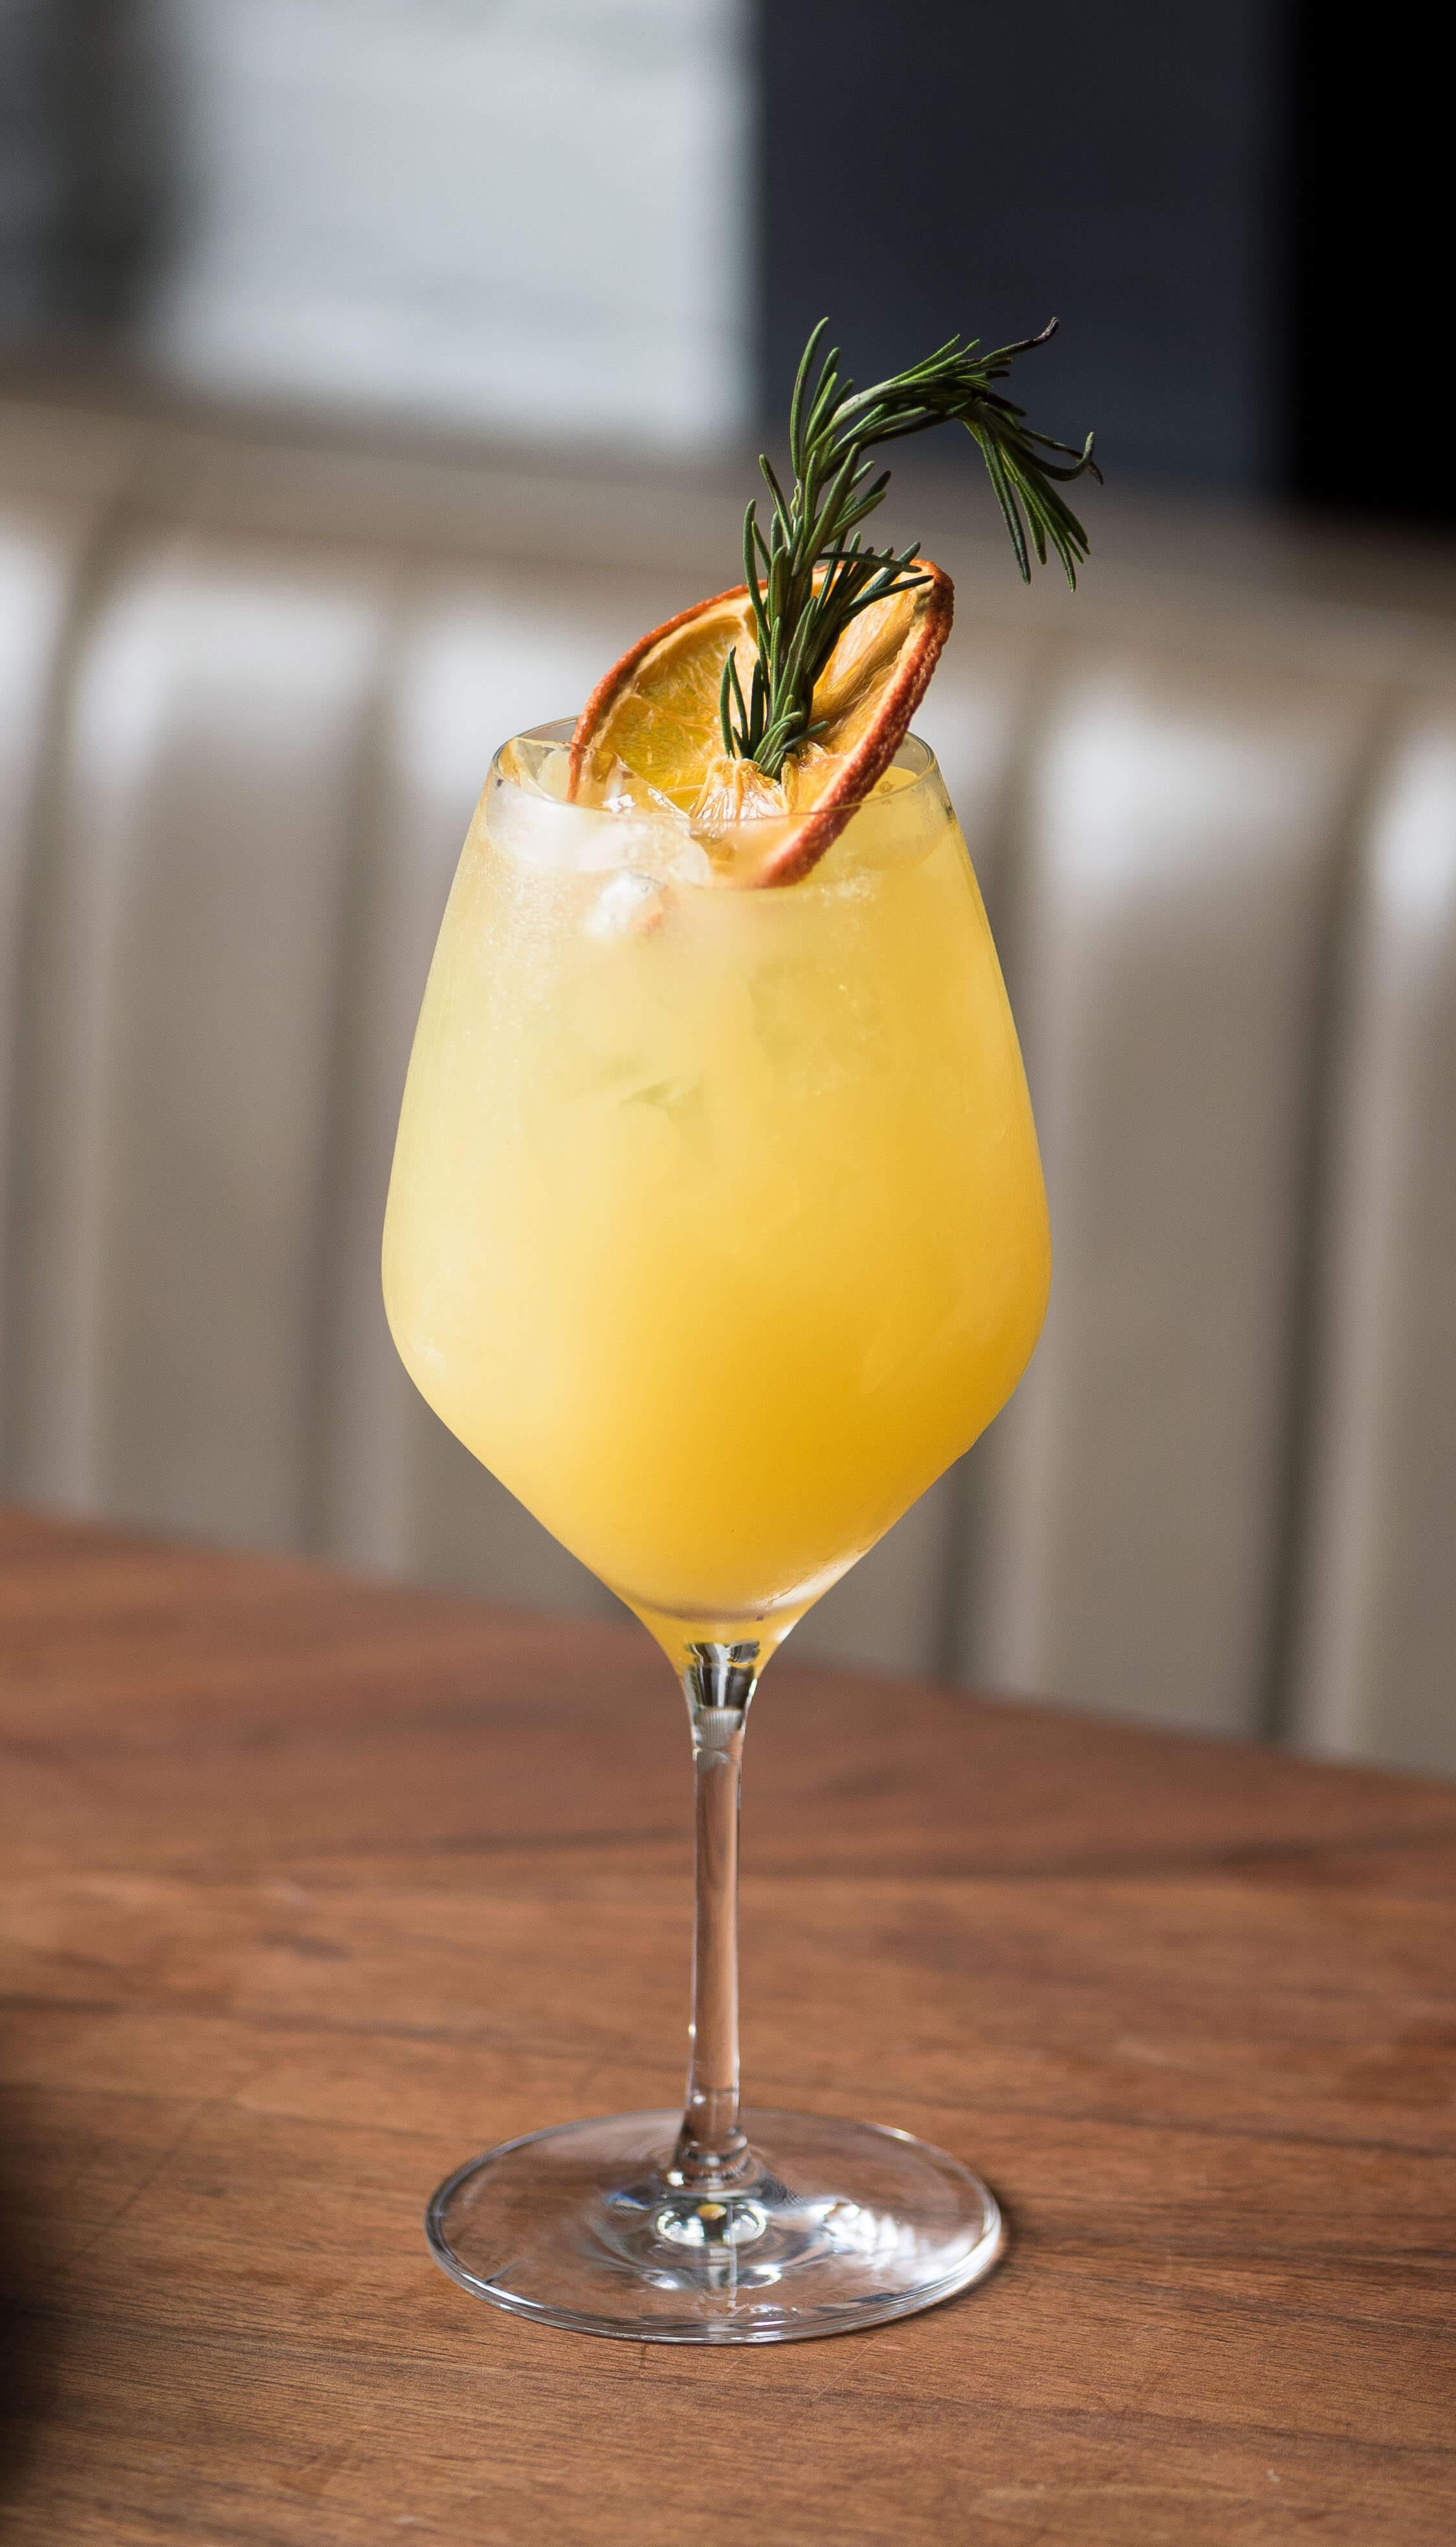 A cocktail from La Sobremesa